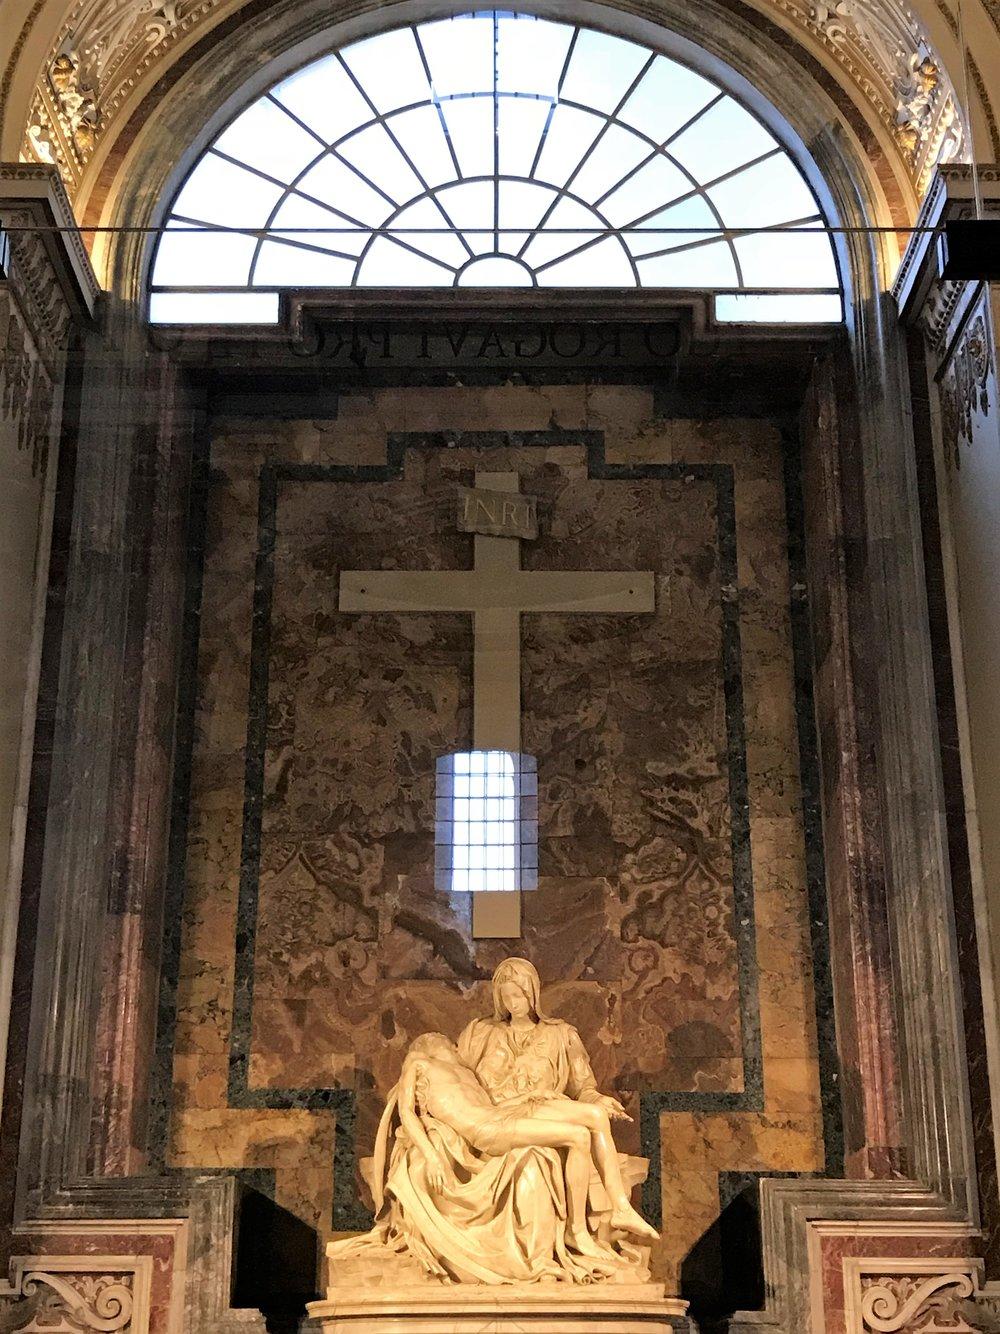 Pieta in St. Peter's Basilica